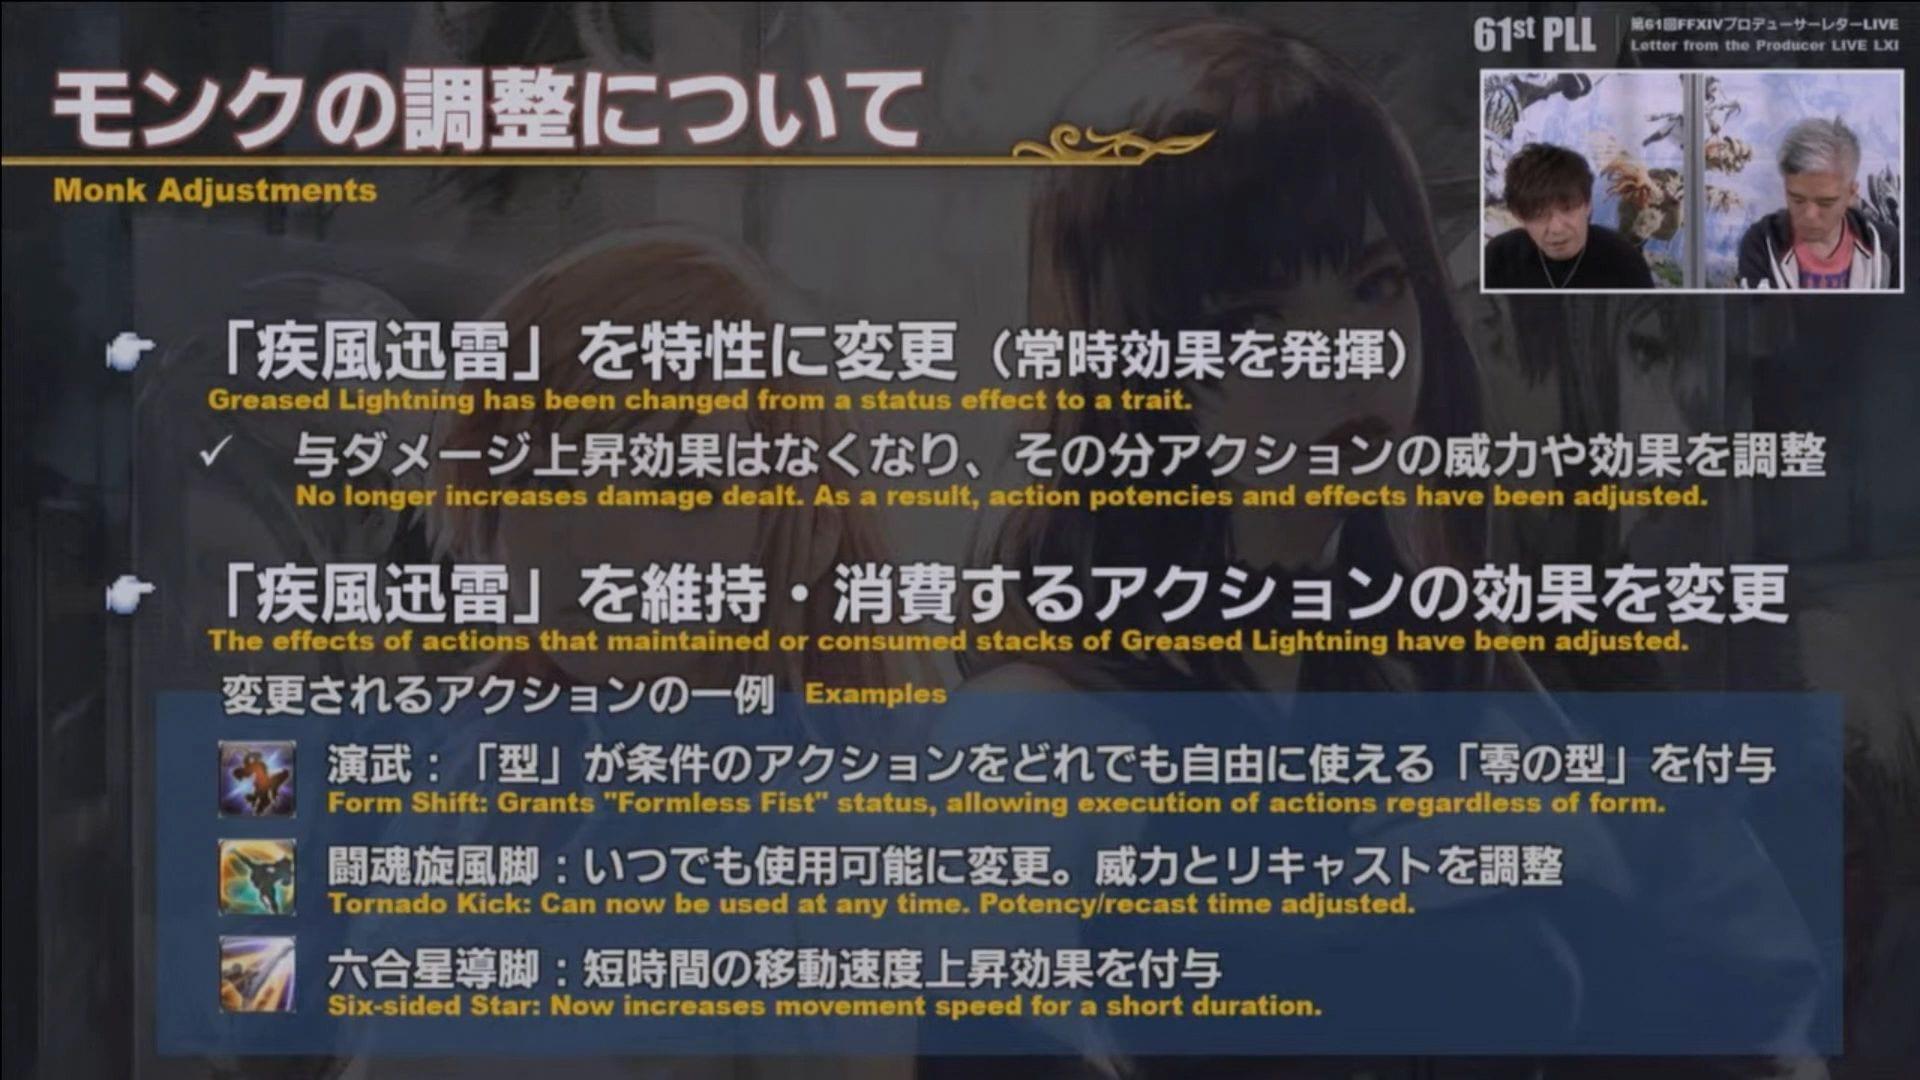 Final-Fantasy-XIV-Screenshot-2020-11-27-13-51-35.jpg?ssl=1